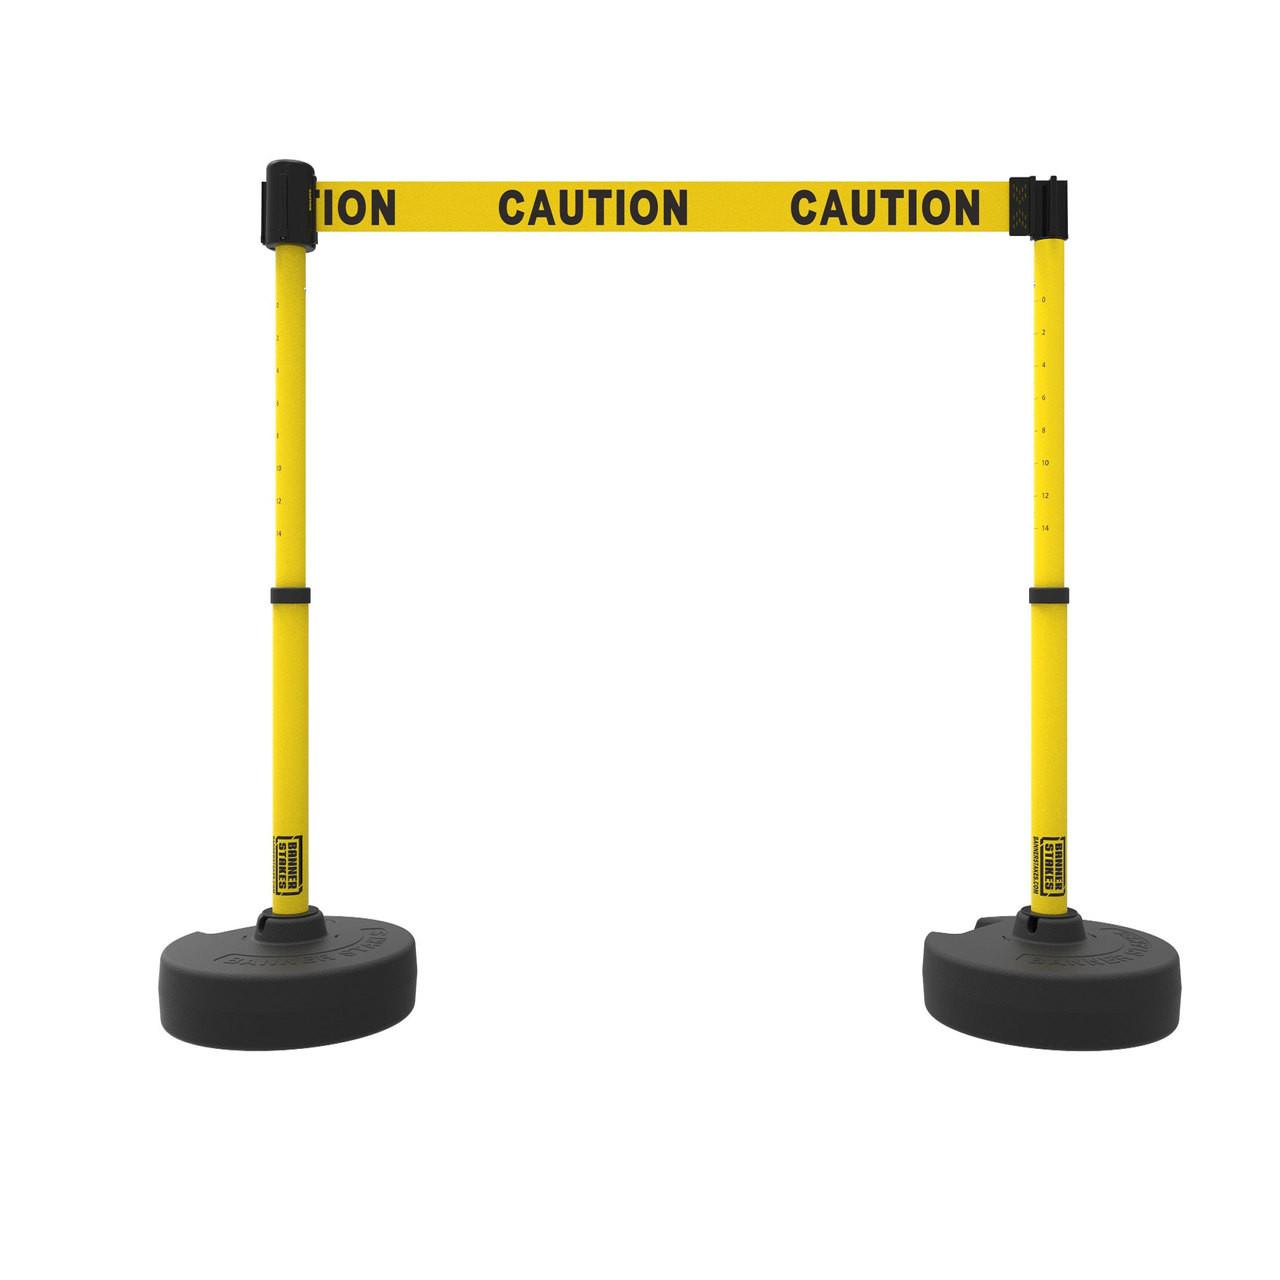 retractable safety barrier set: 2 stanchions, 15' caution tape